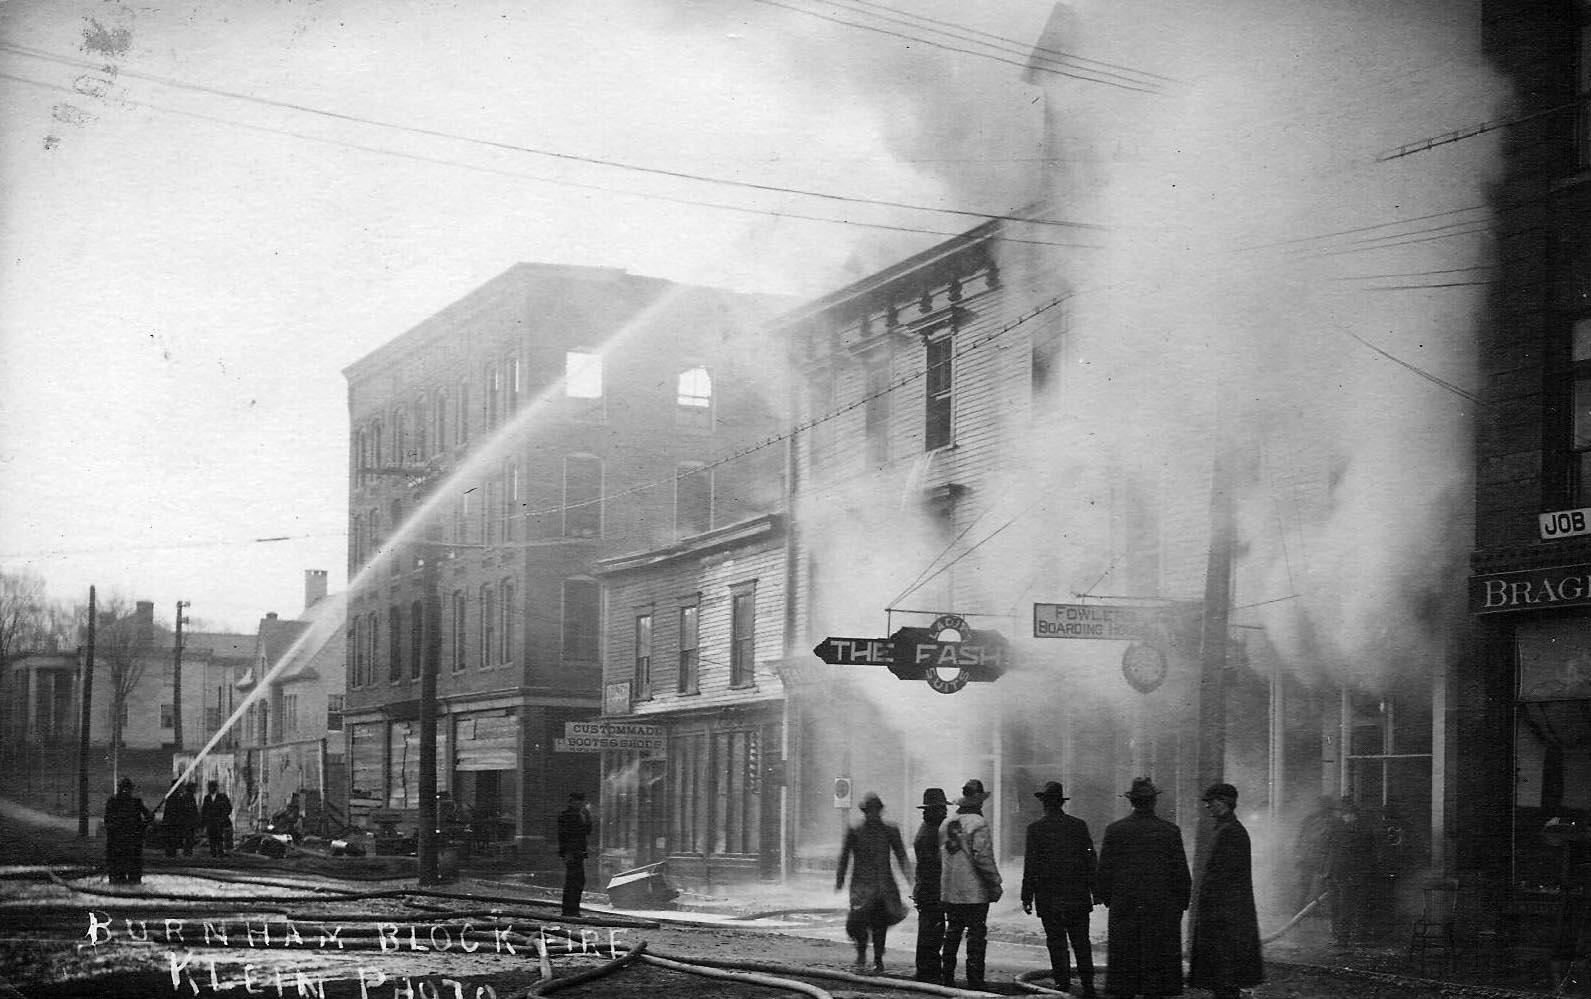 Burnham Block Fire